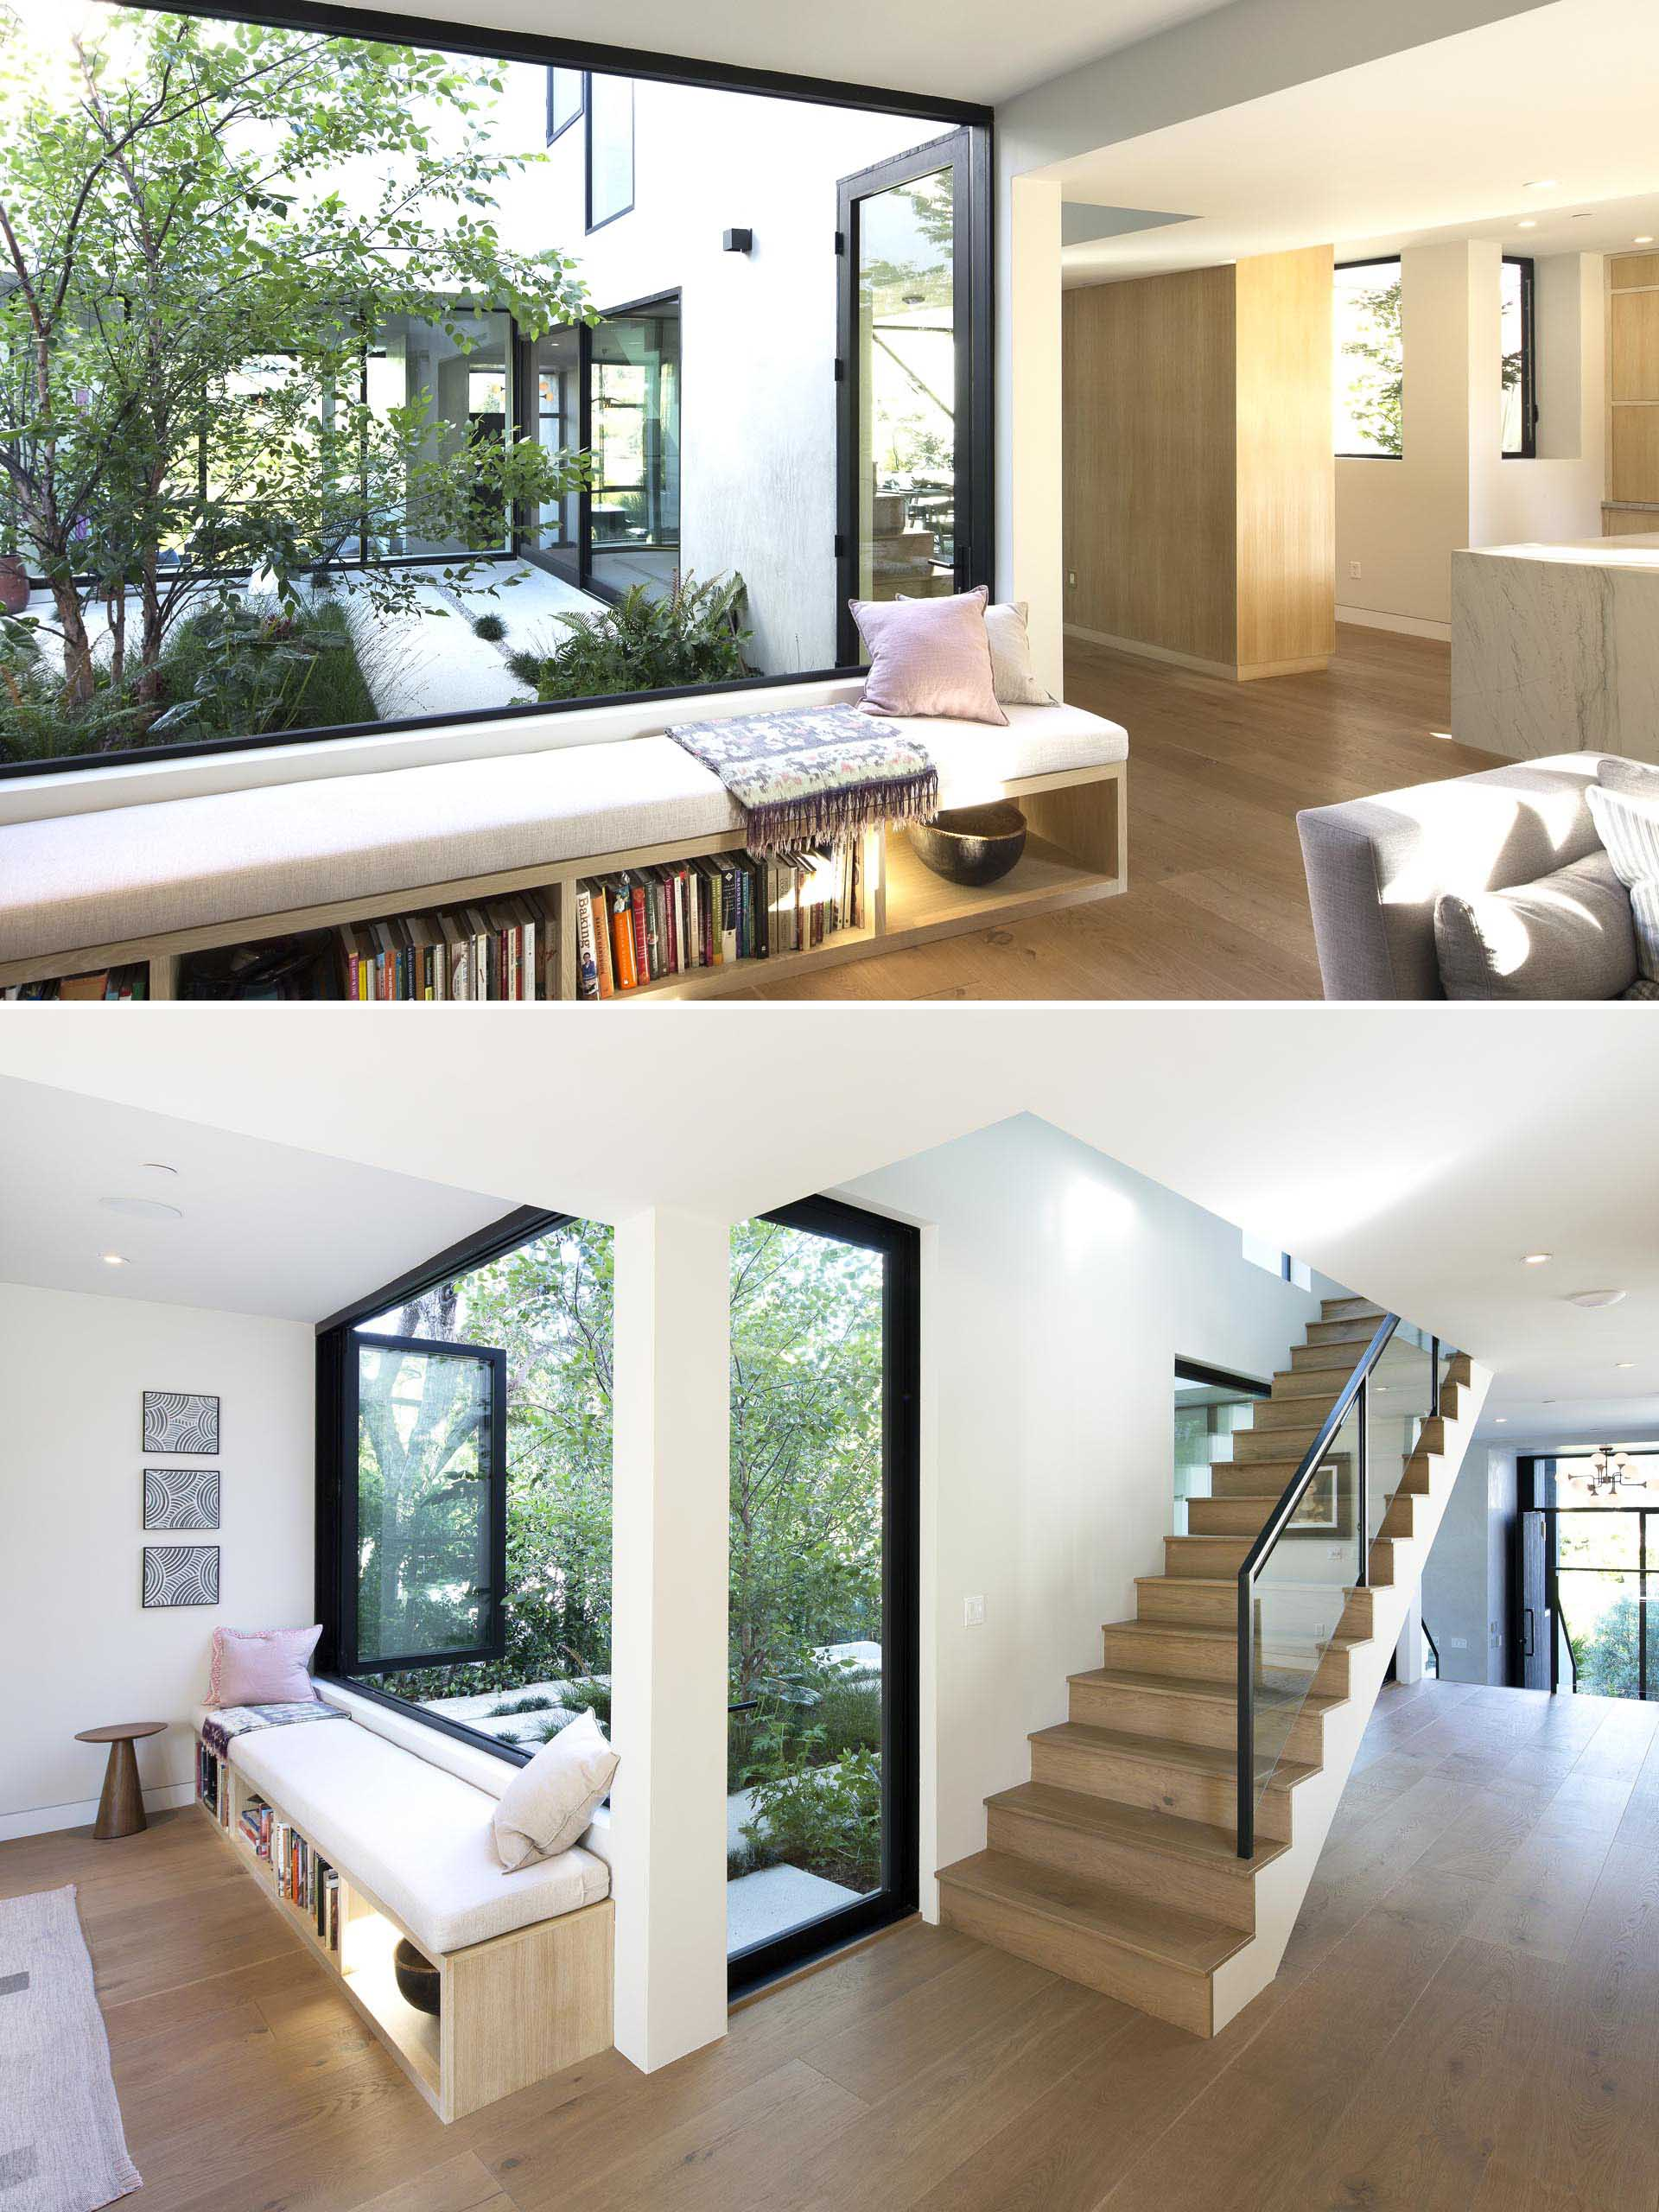 A modern window bench with a built-in bookshelf.